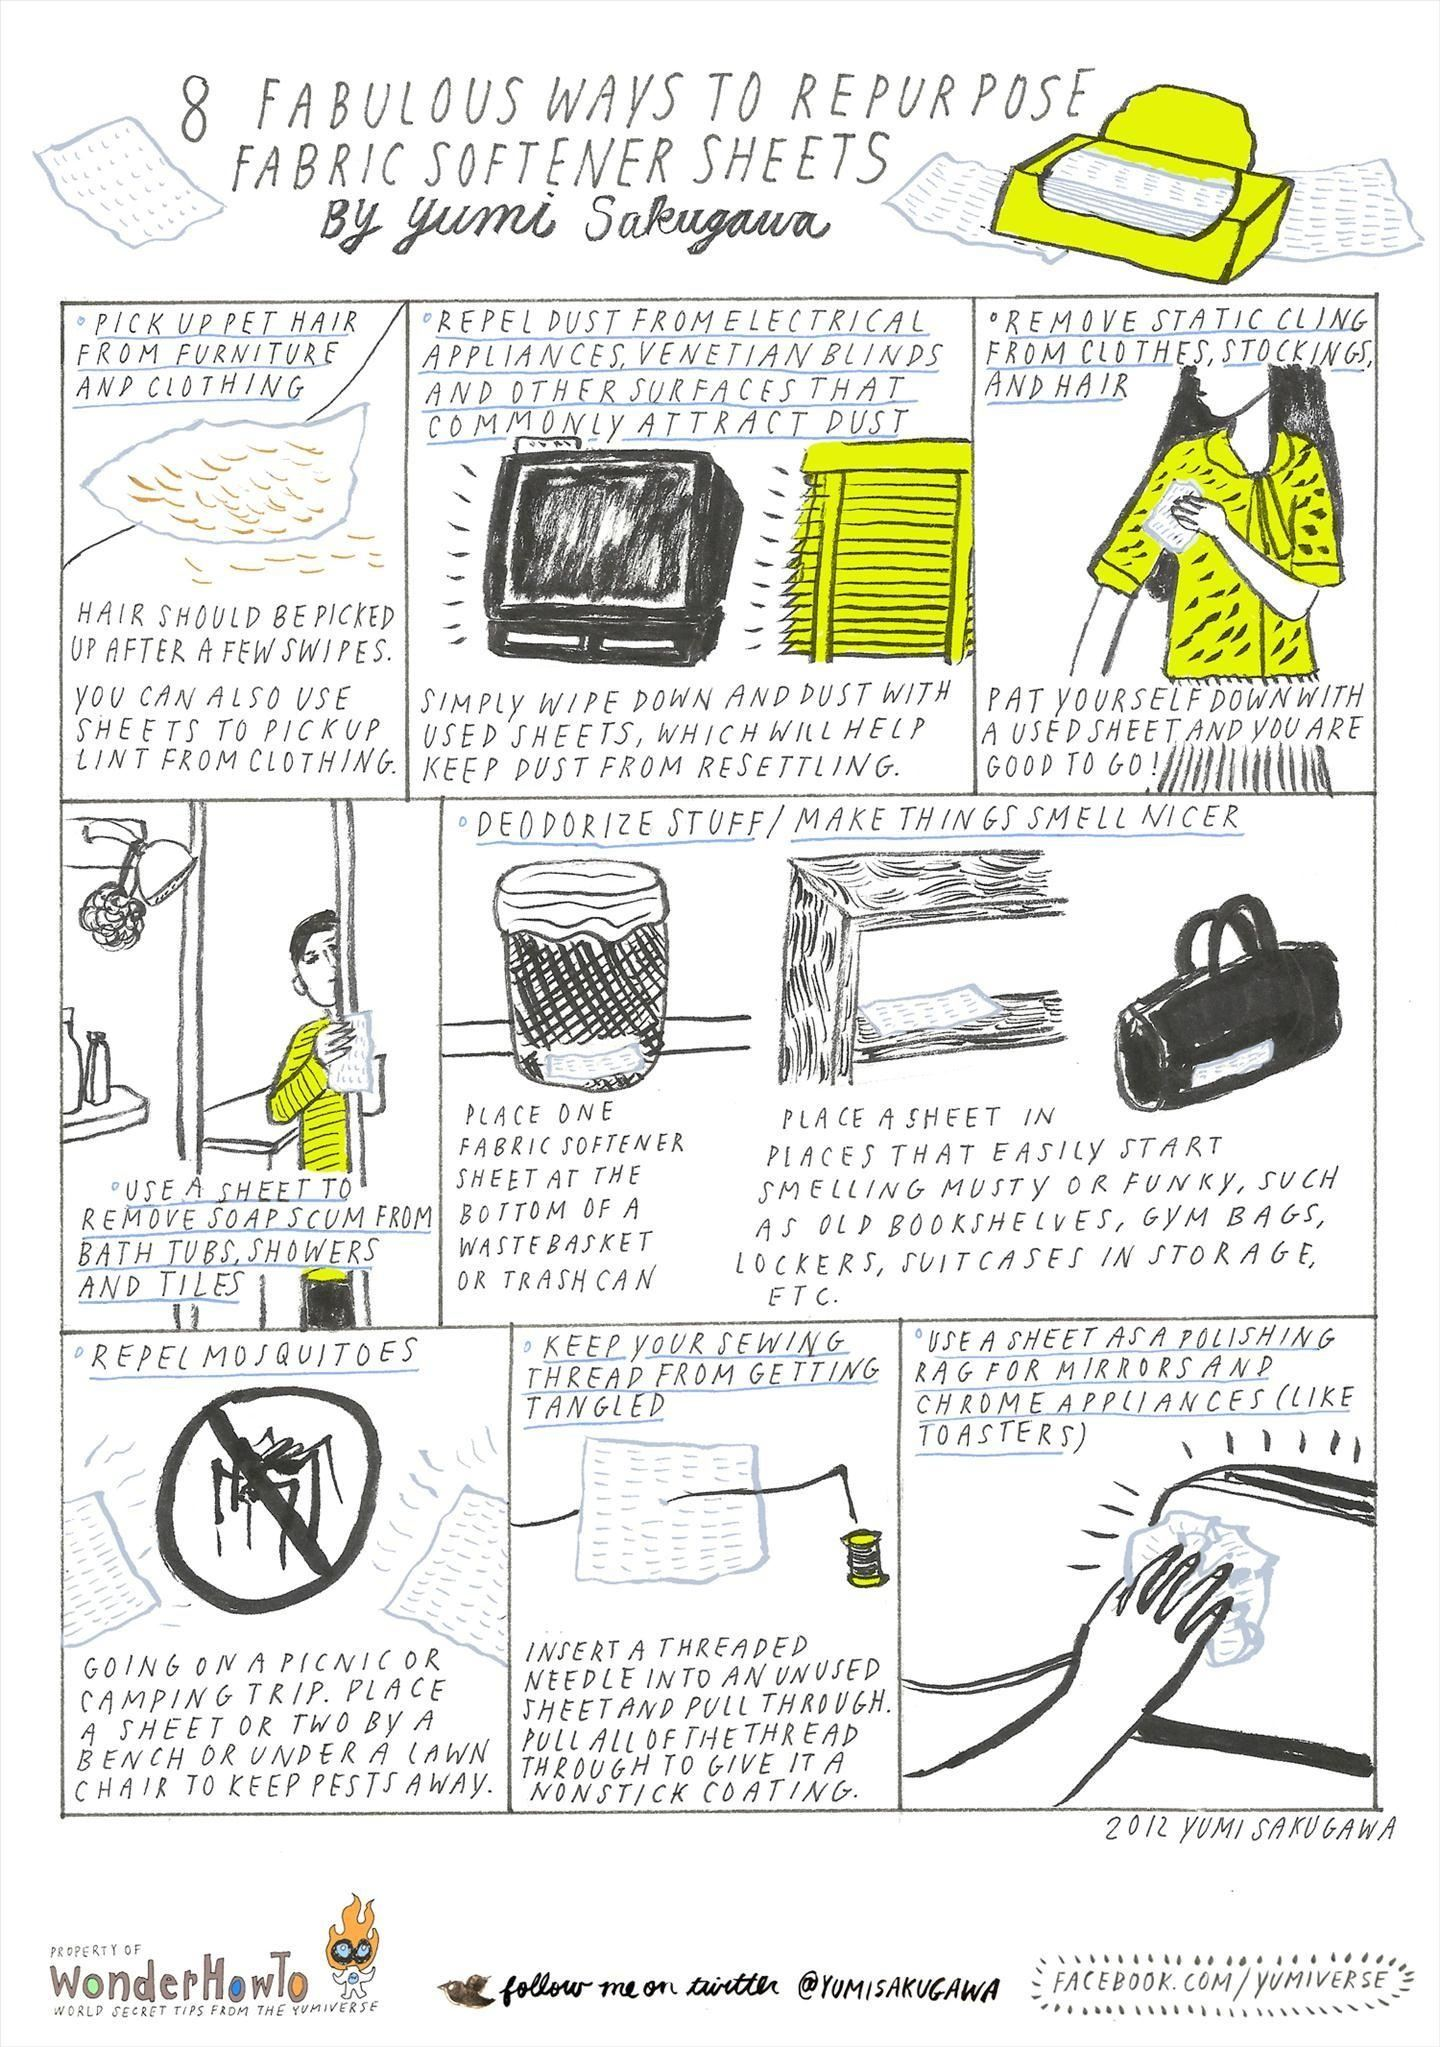 8 Fabulous Ways to Repurpose Fabric Softener Dryer Sheets